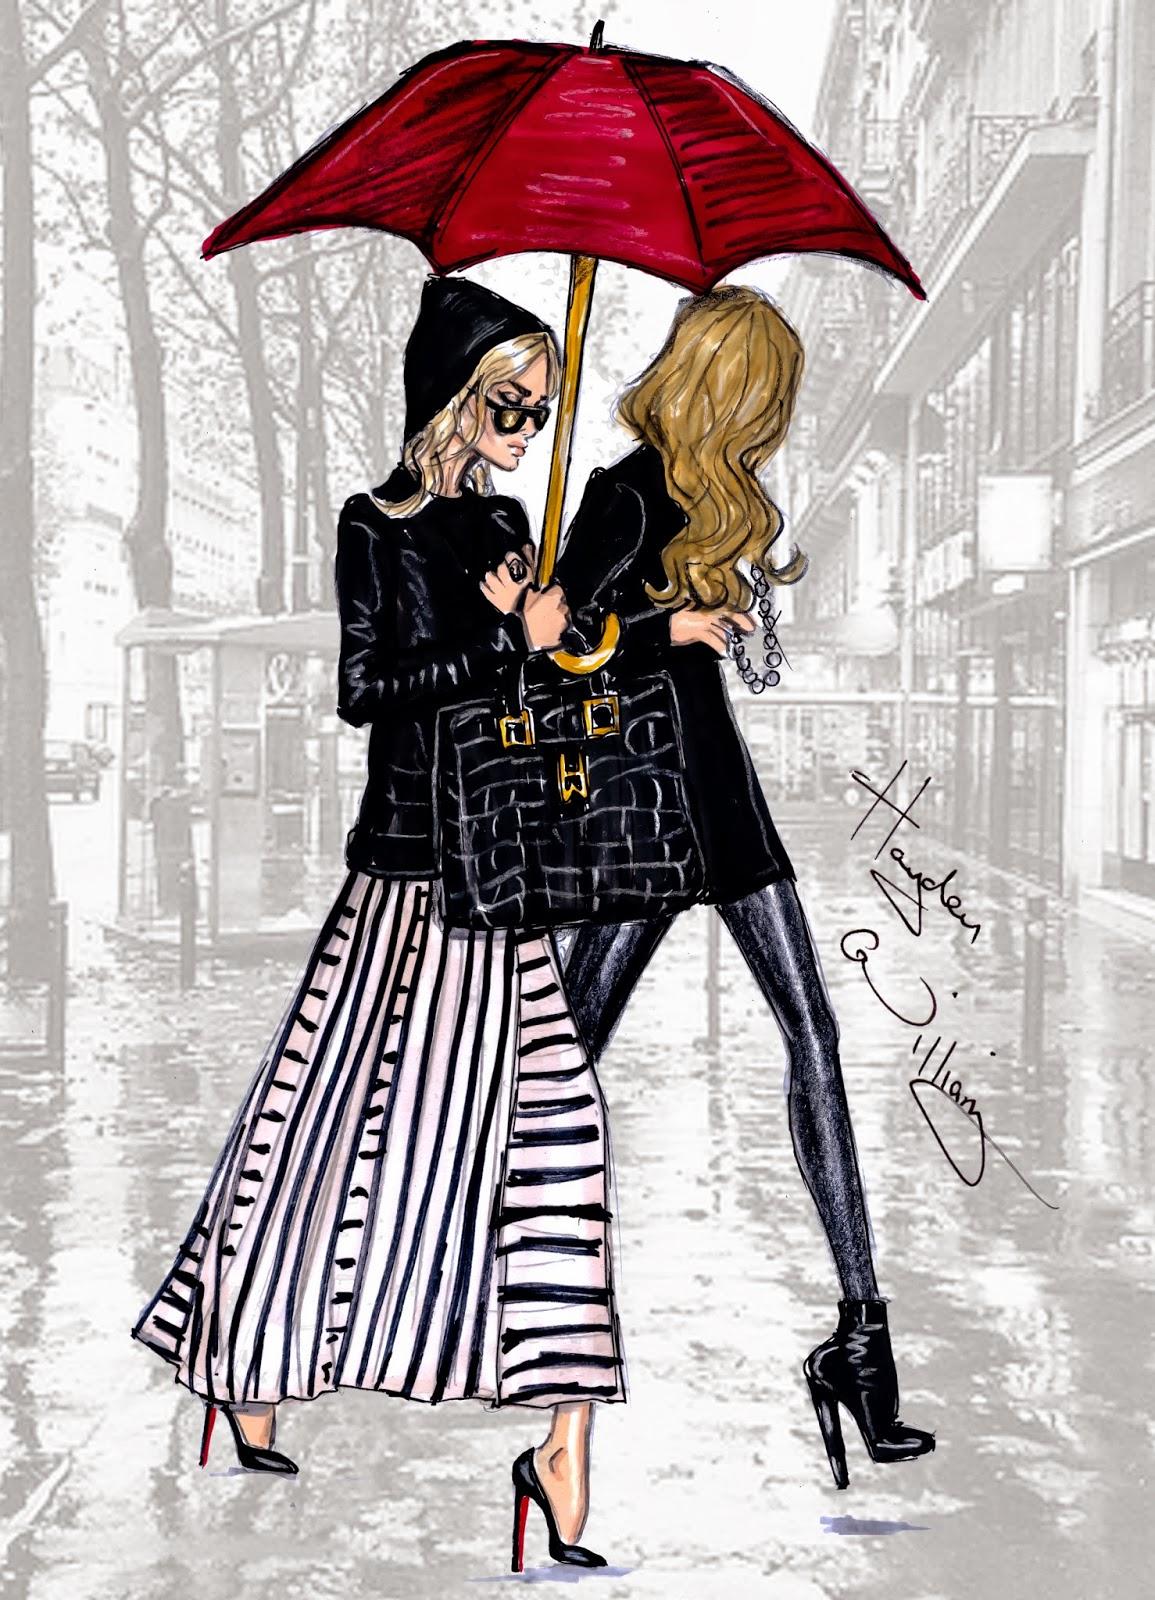 Hayden Williams Fashion Illustrations 39 The Olsen 39 S In Paris 39 By Hayden Williams